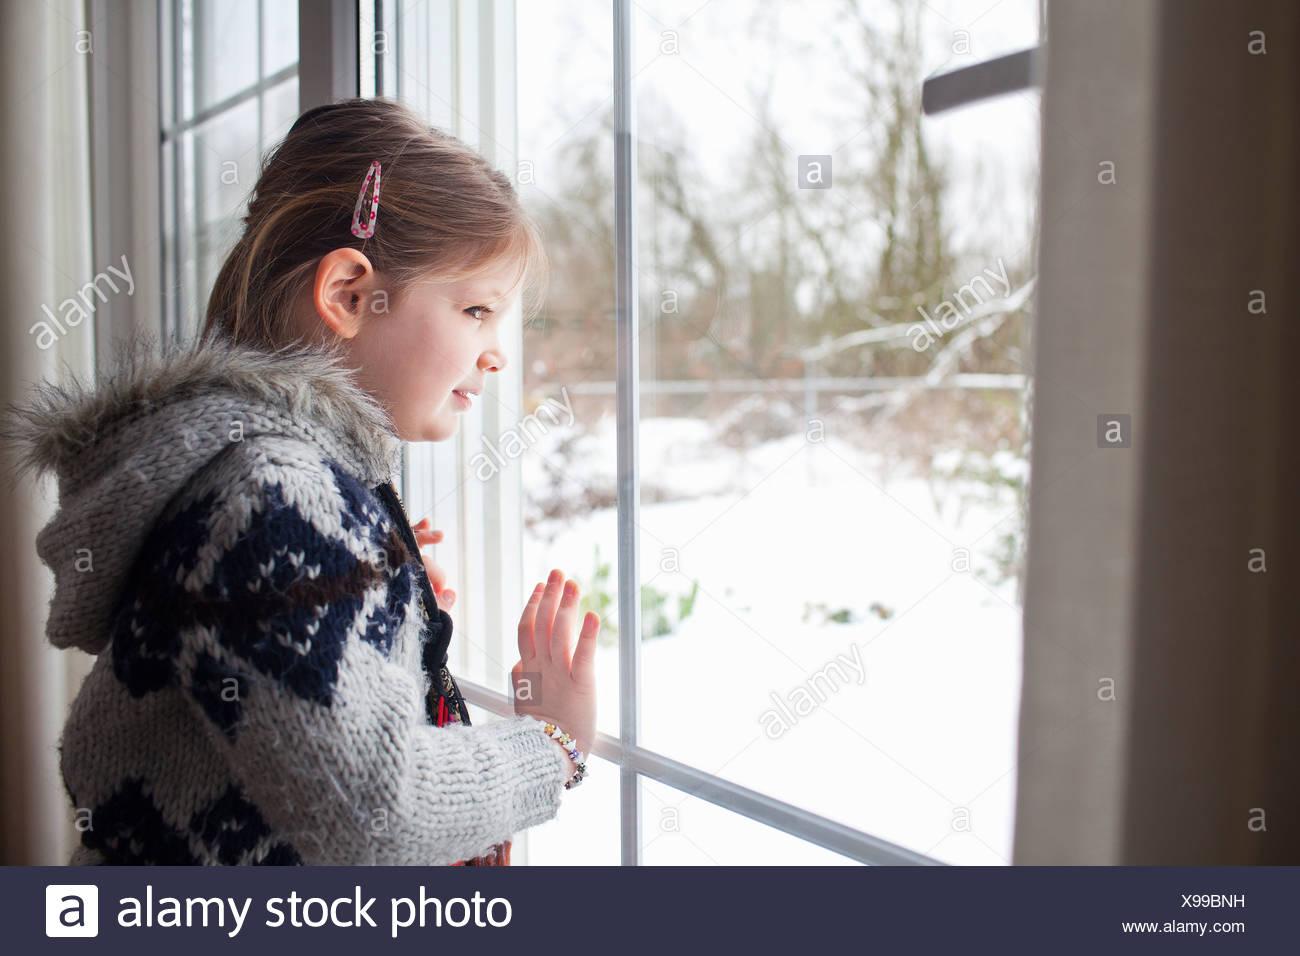 Niña mirando por la ventana al jardín de nieve Imagen De Stock